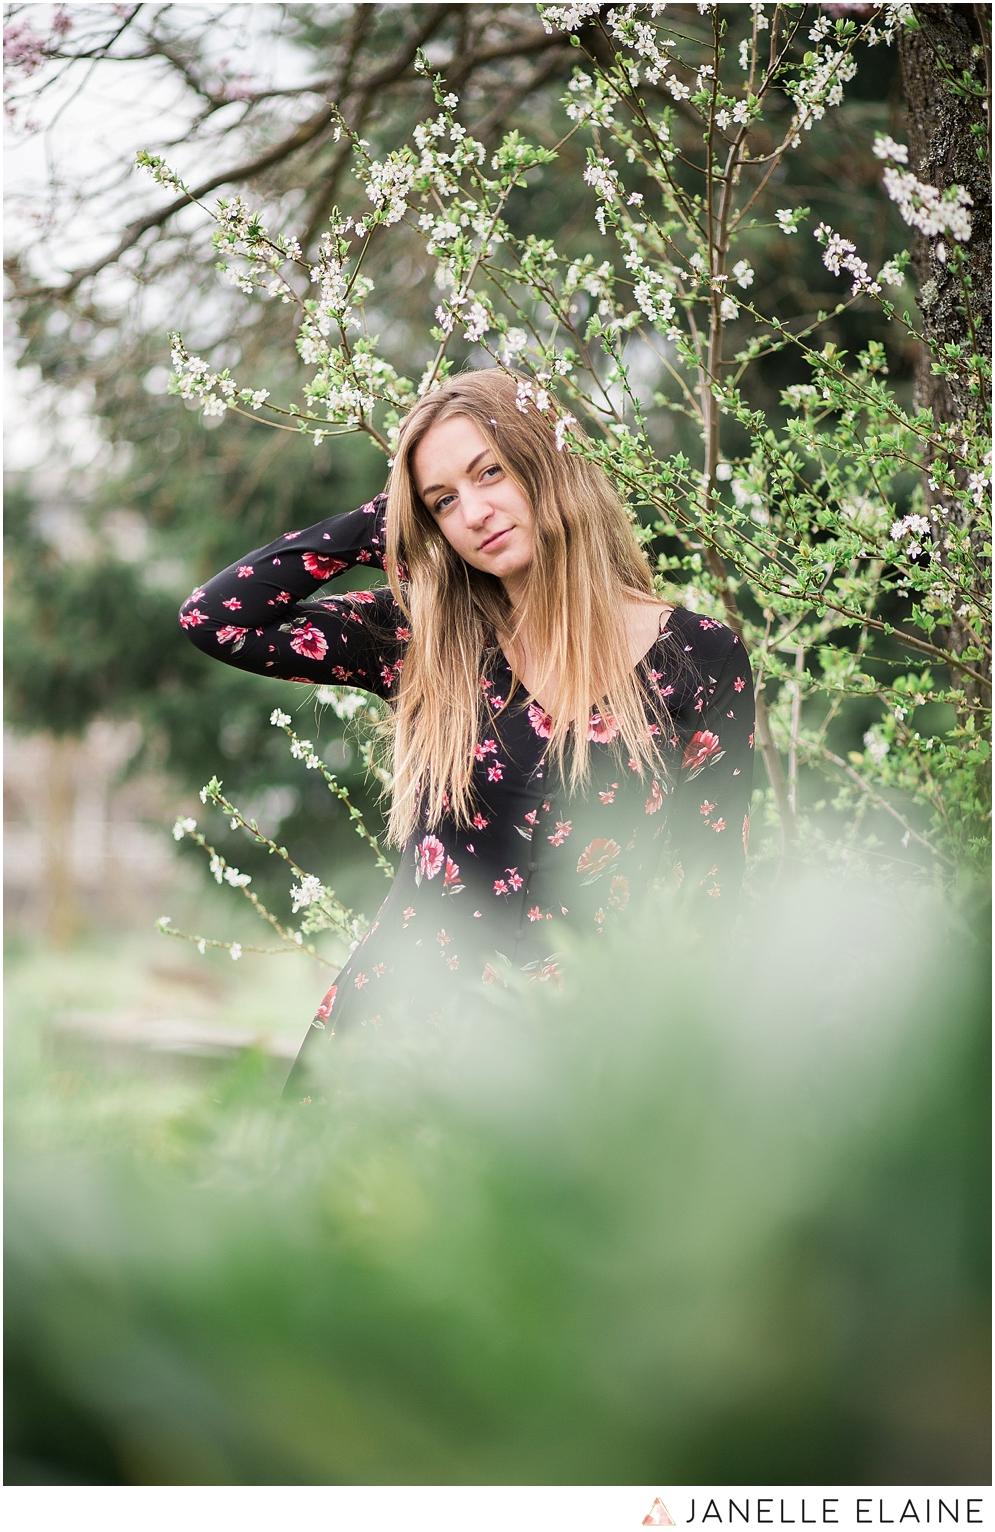 kirsi-renton wa portrait sesssion-cherry blossom-h&m dress-seattle photographer janelle elaine photography-37.jpg